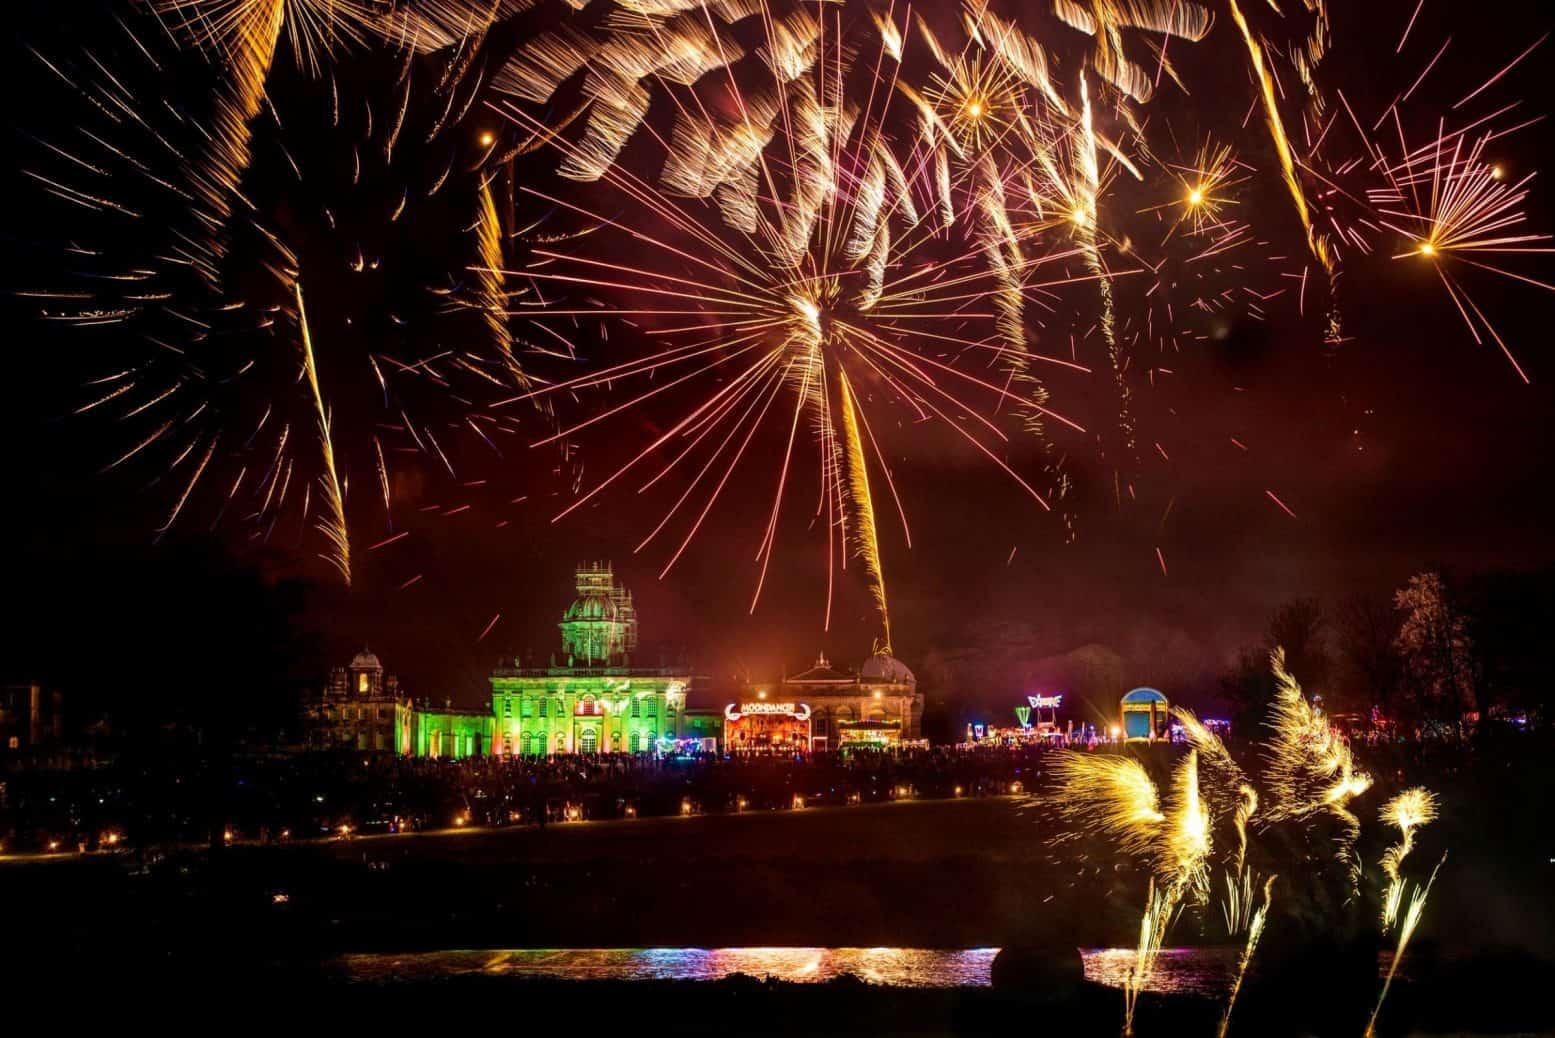 Fireworks Display and Bonfire Night York 2017